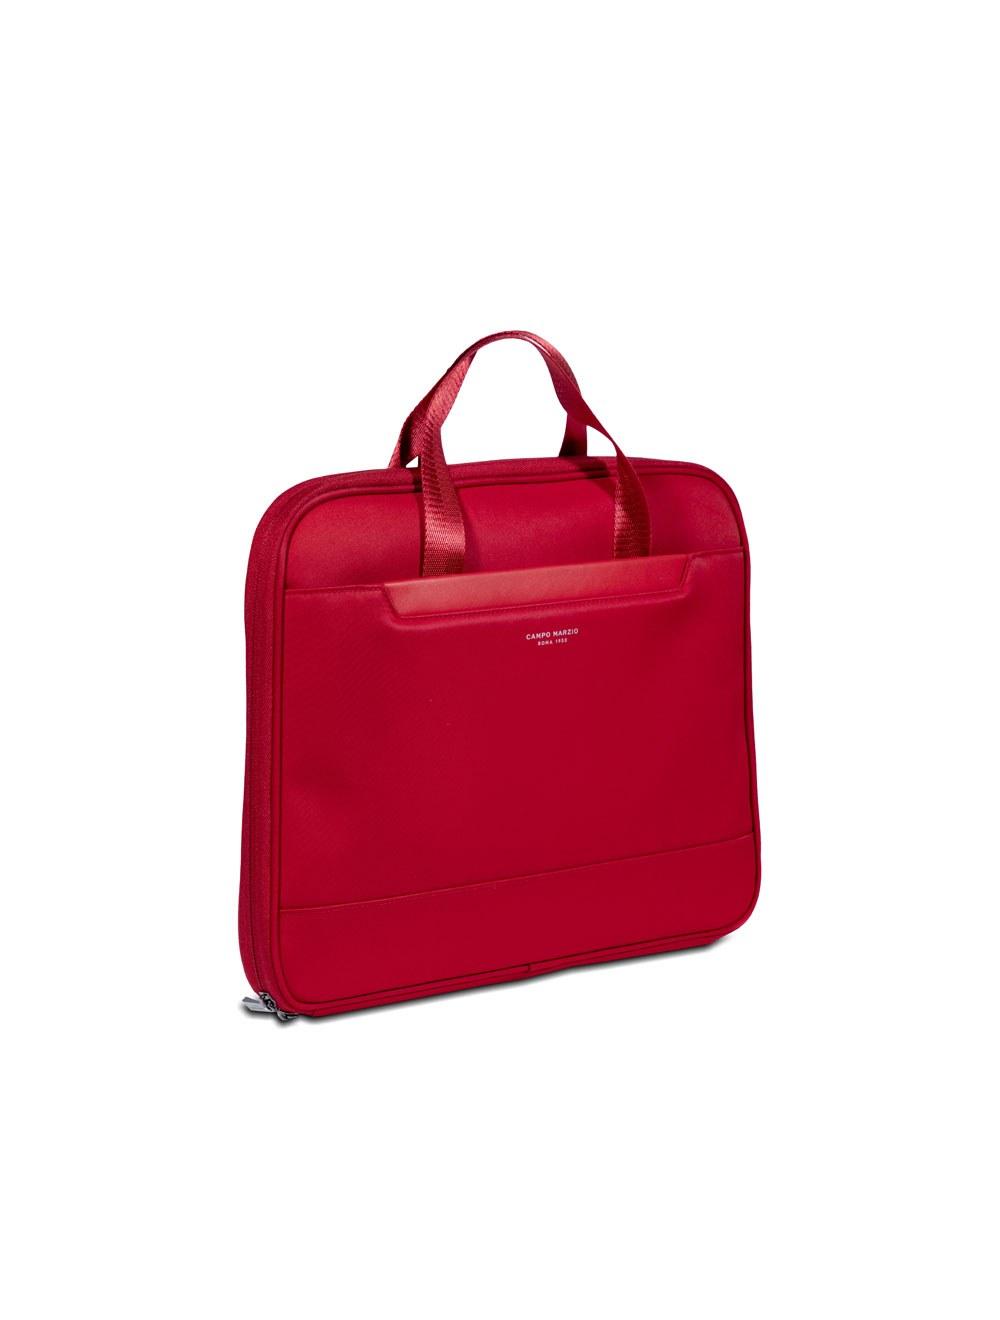 "Laptop Holder 15"" Slim - Cherry Red"